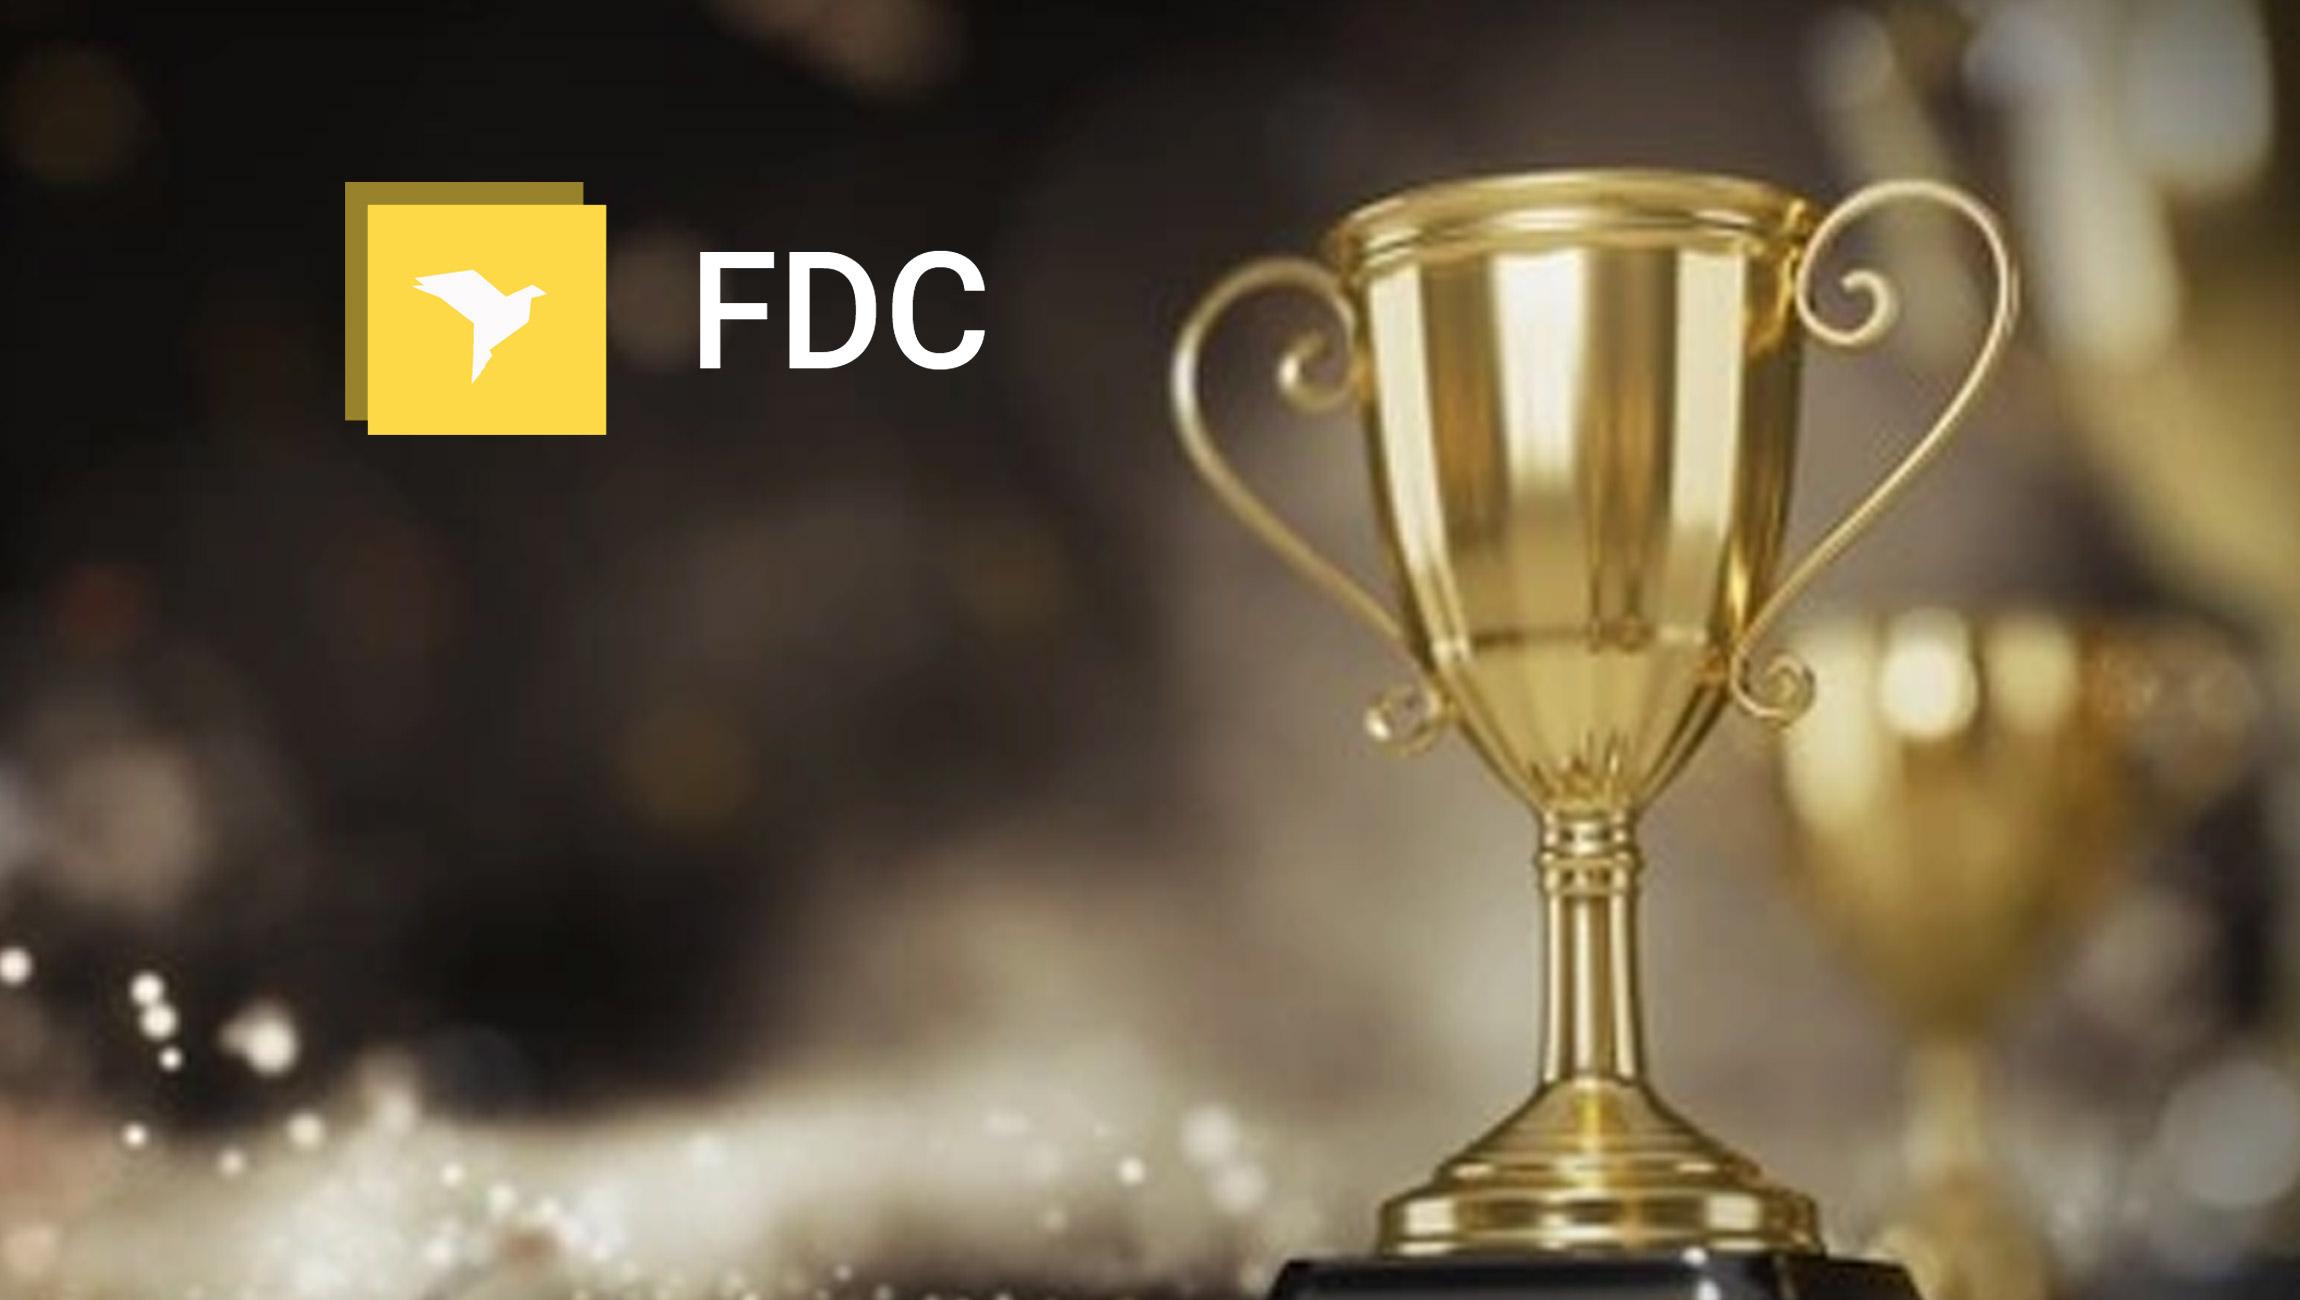 FDCTech Partners and Integrates Award-Winning SkaleCRM software with Condor FX Trading Platform